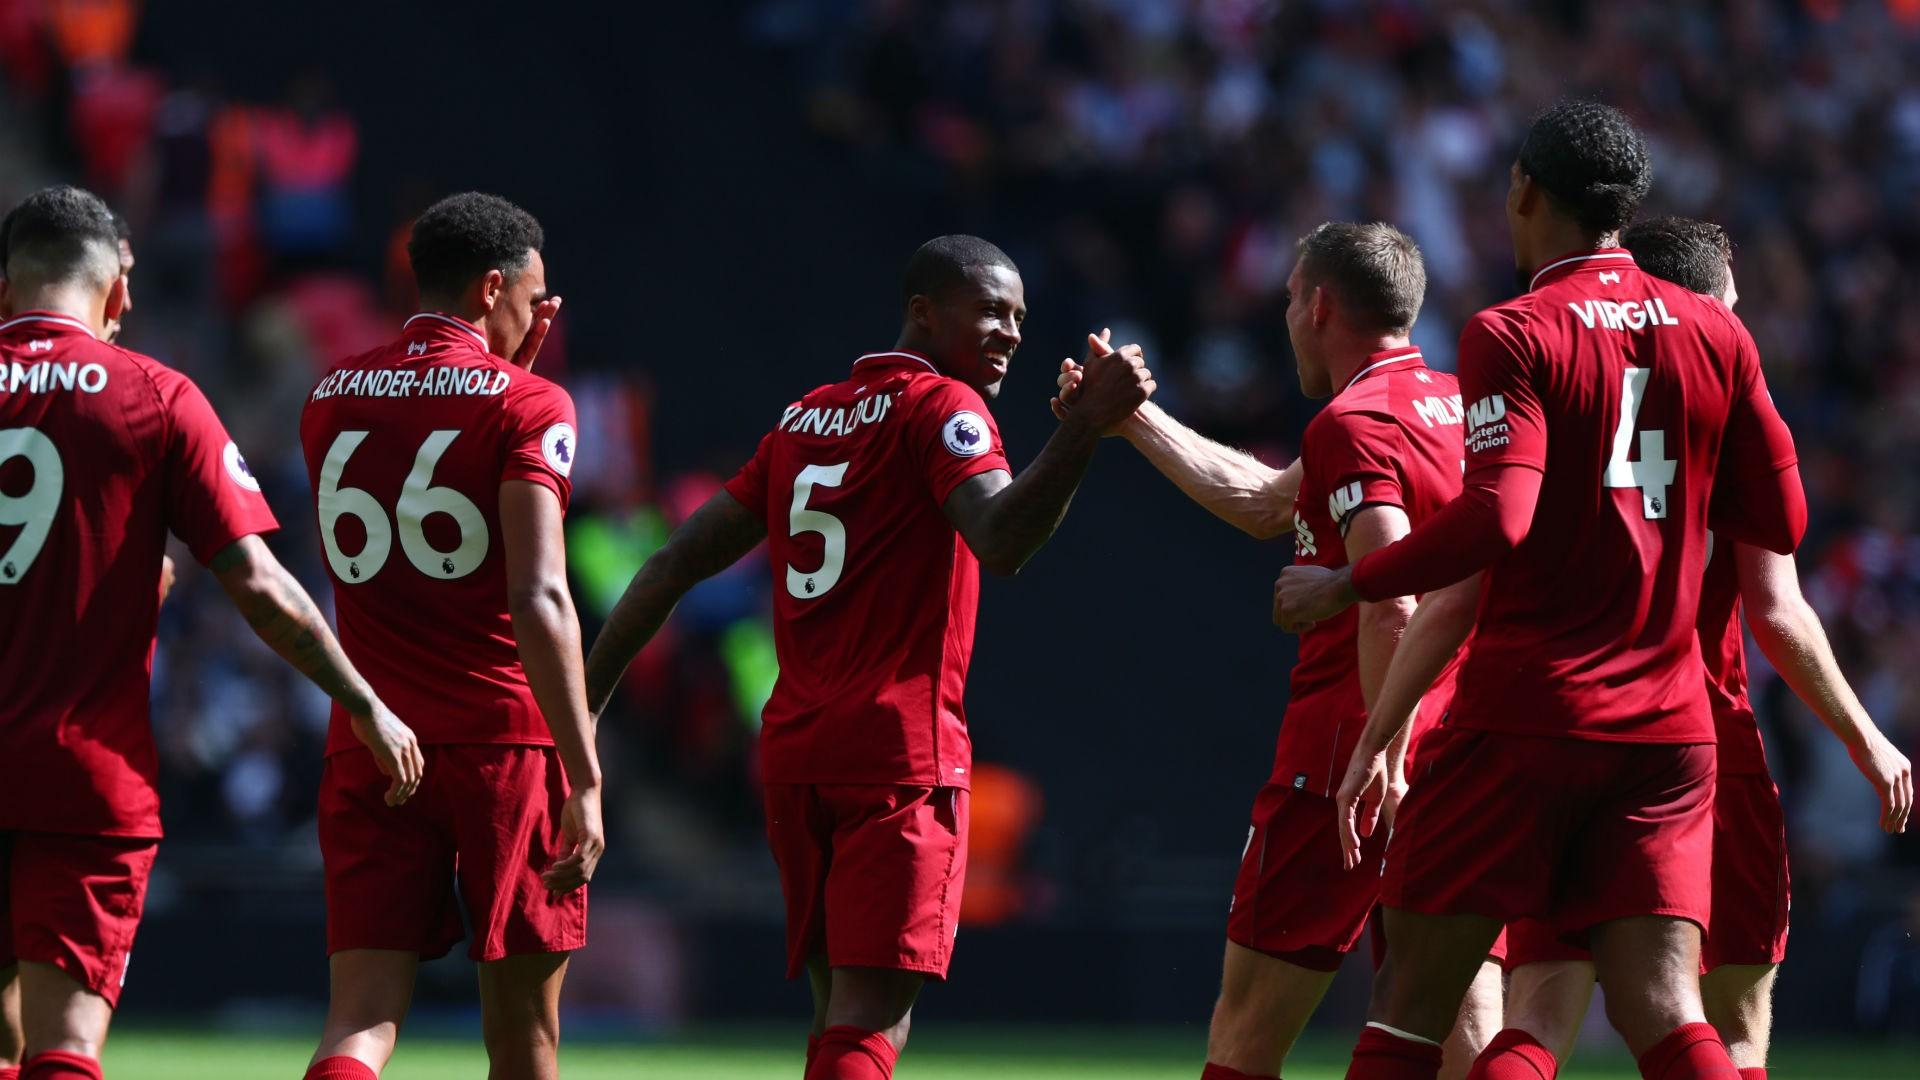 Tottenham 1-2 Liverpool Video Highlights